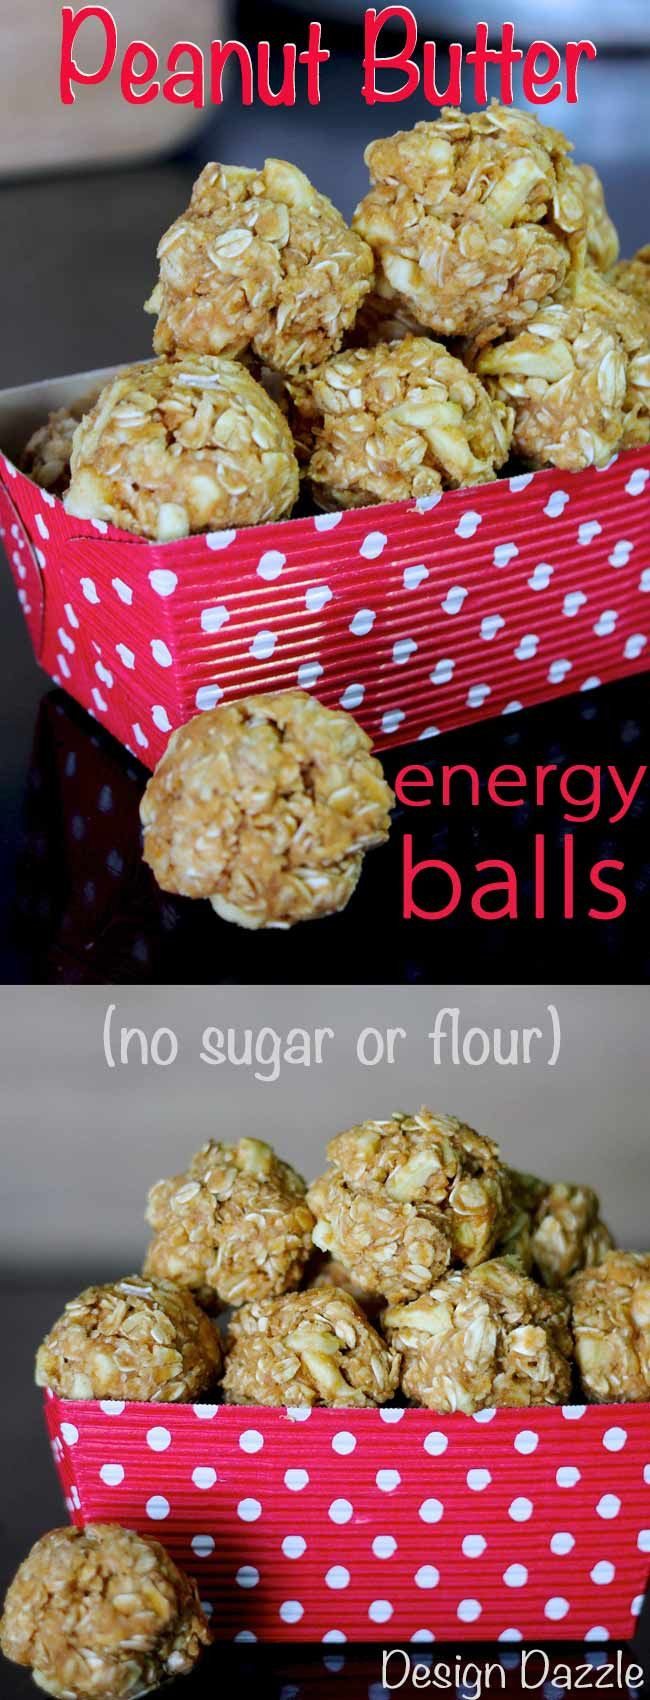 Healthy Peanut Butter Snacks  Peanut Butter Oatmeal Energy Balls Recipe